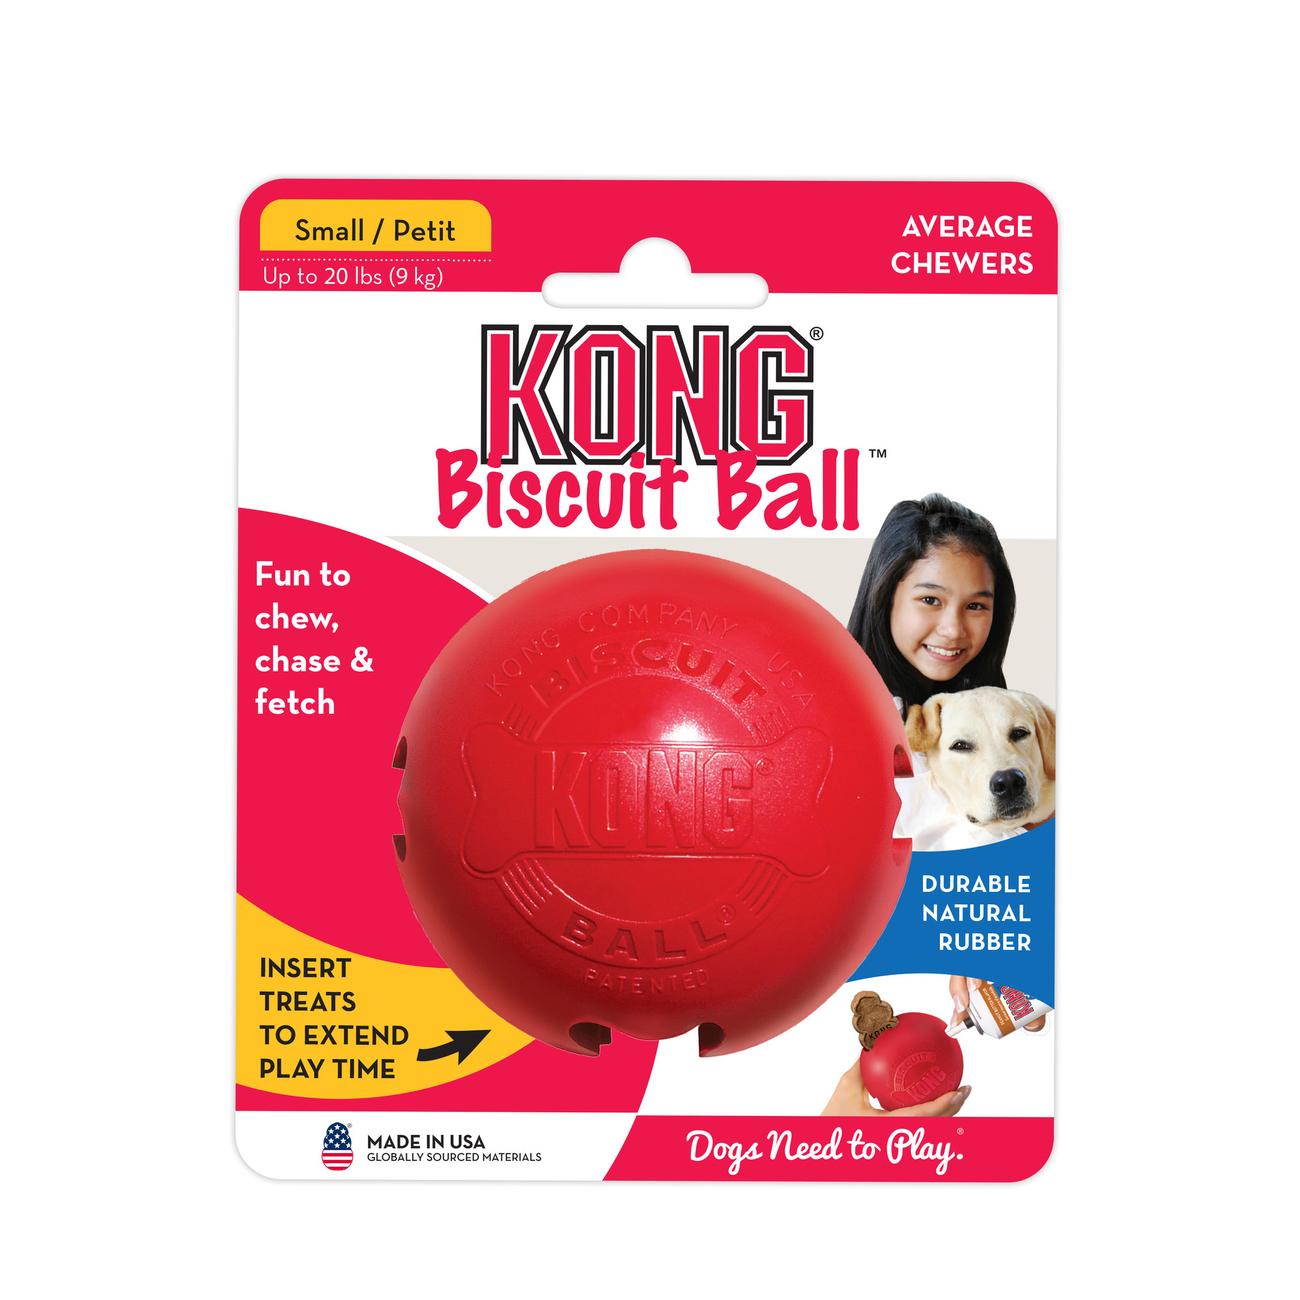 KONG Biscuit Ball Hundespielzeug, Bild 2